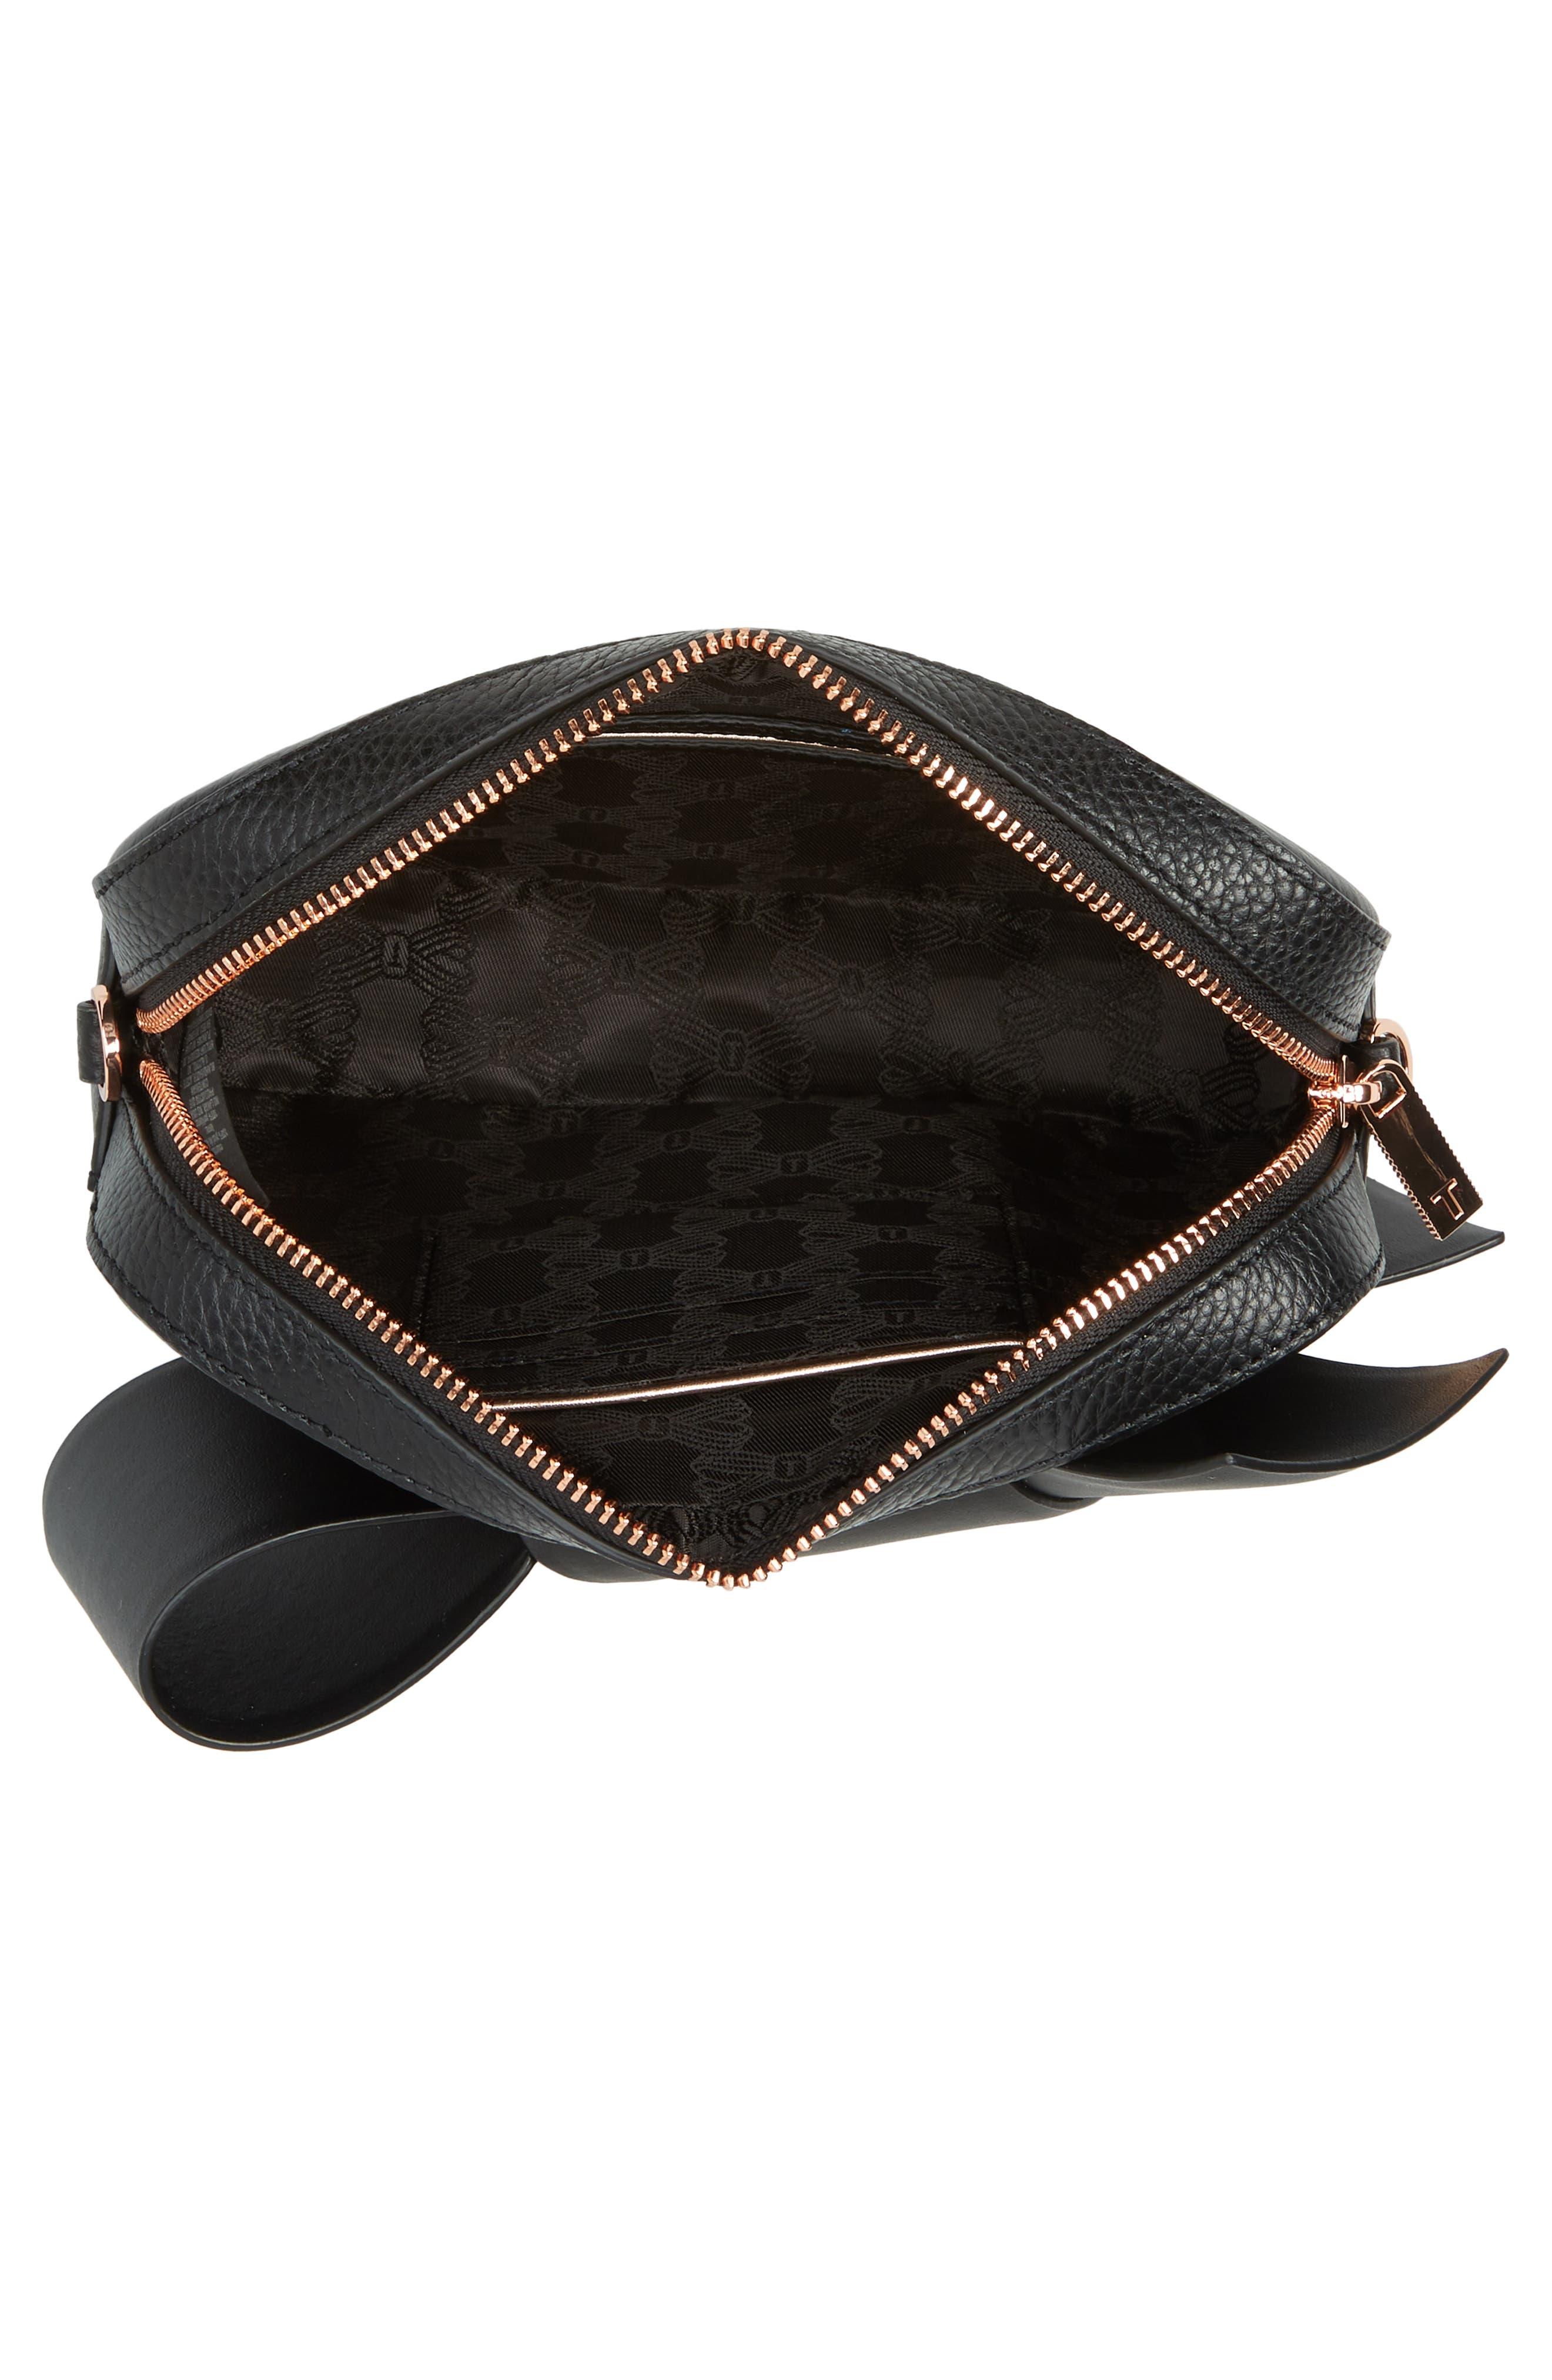 Giant Knot Leather Camera Bag,                             Alternate thumbnail 4, color,                             BLACK